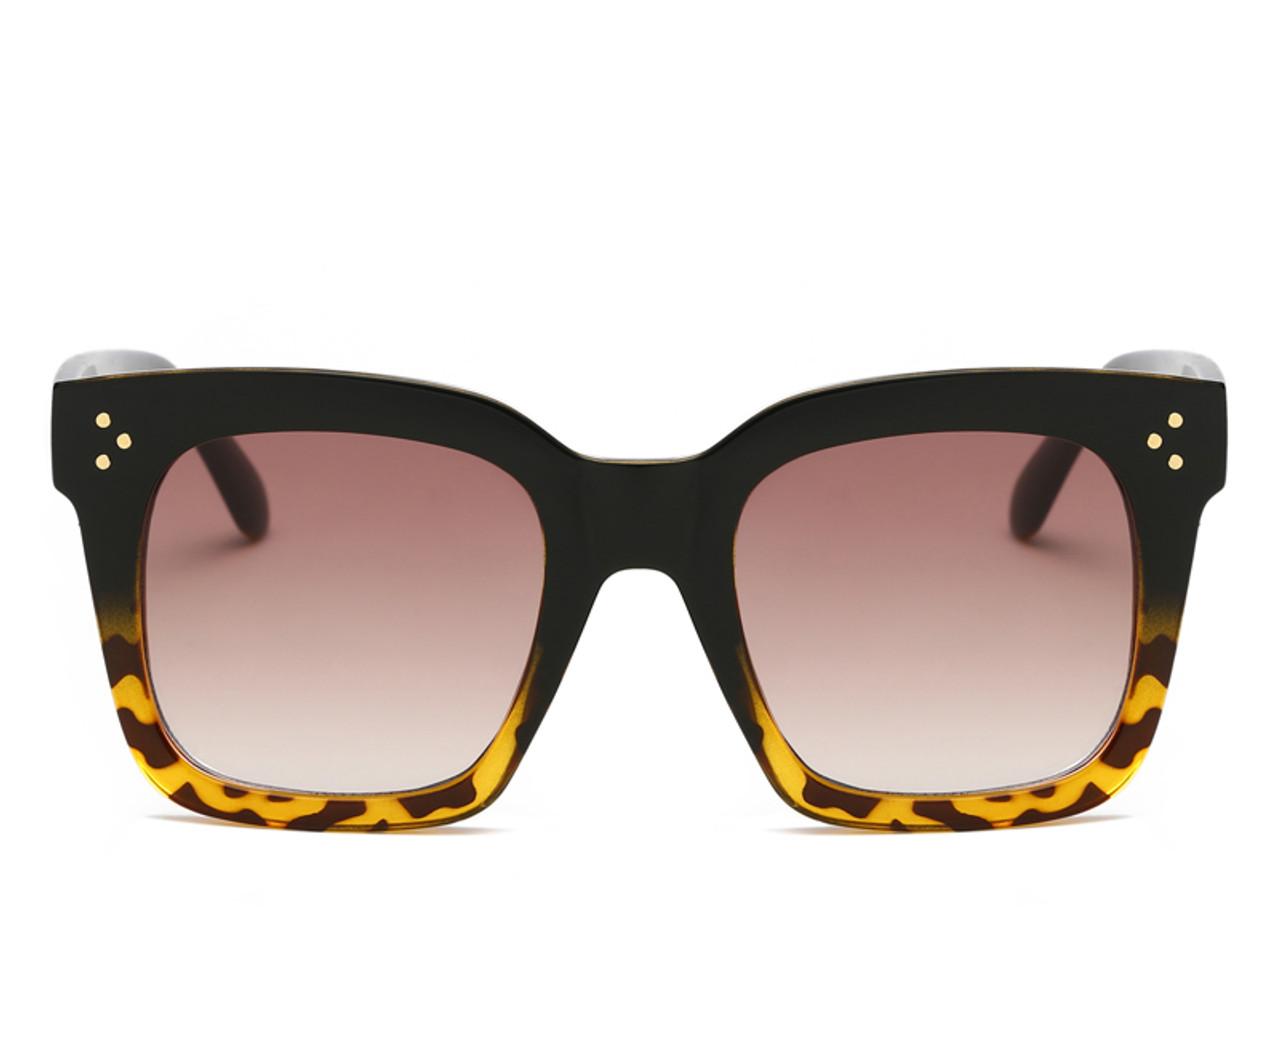 40b091e63b74 Luxury Square Sunglasses Women Fashion Brand Designer Big Frame Gradient  Lens Classic Rivet Shades Female Male Eyewear UV400